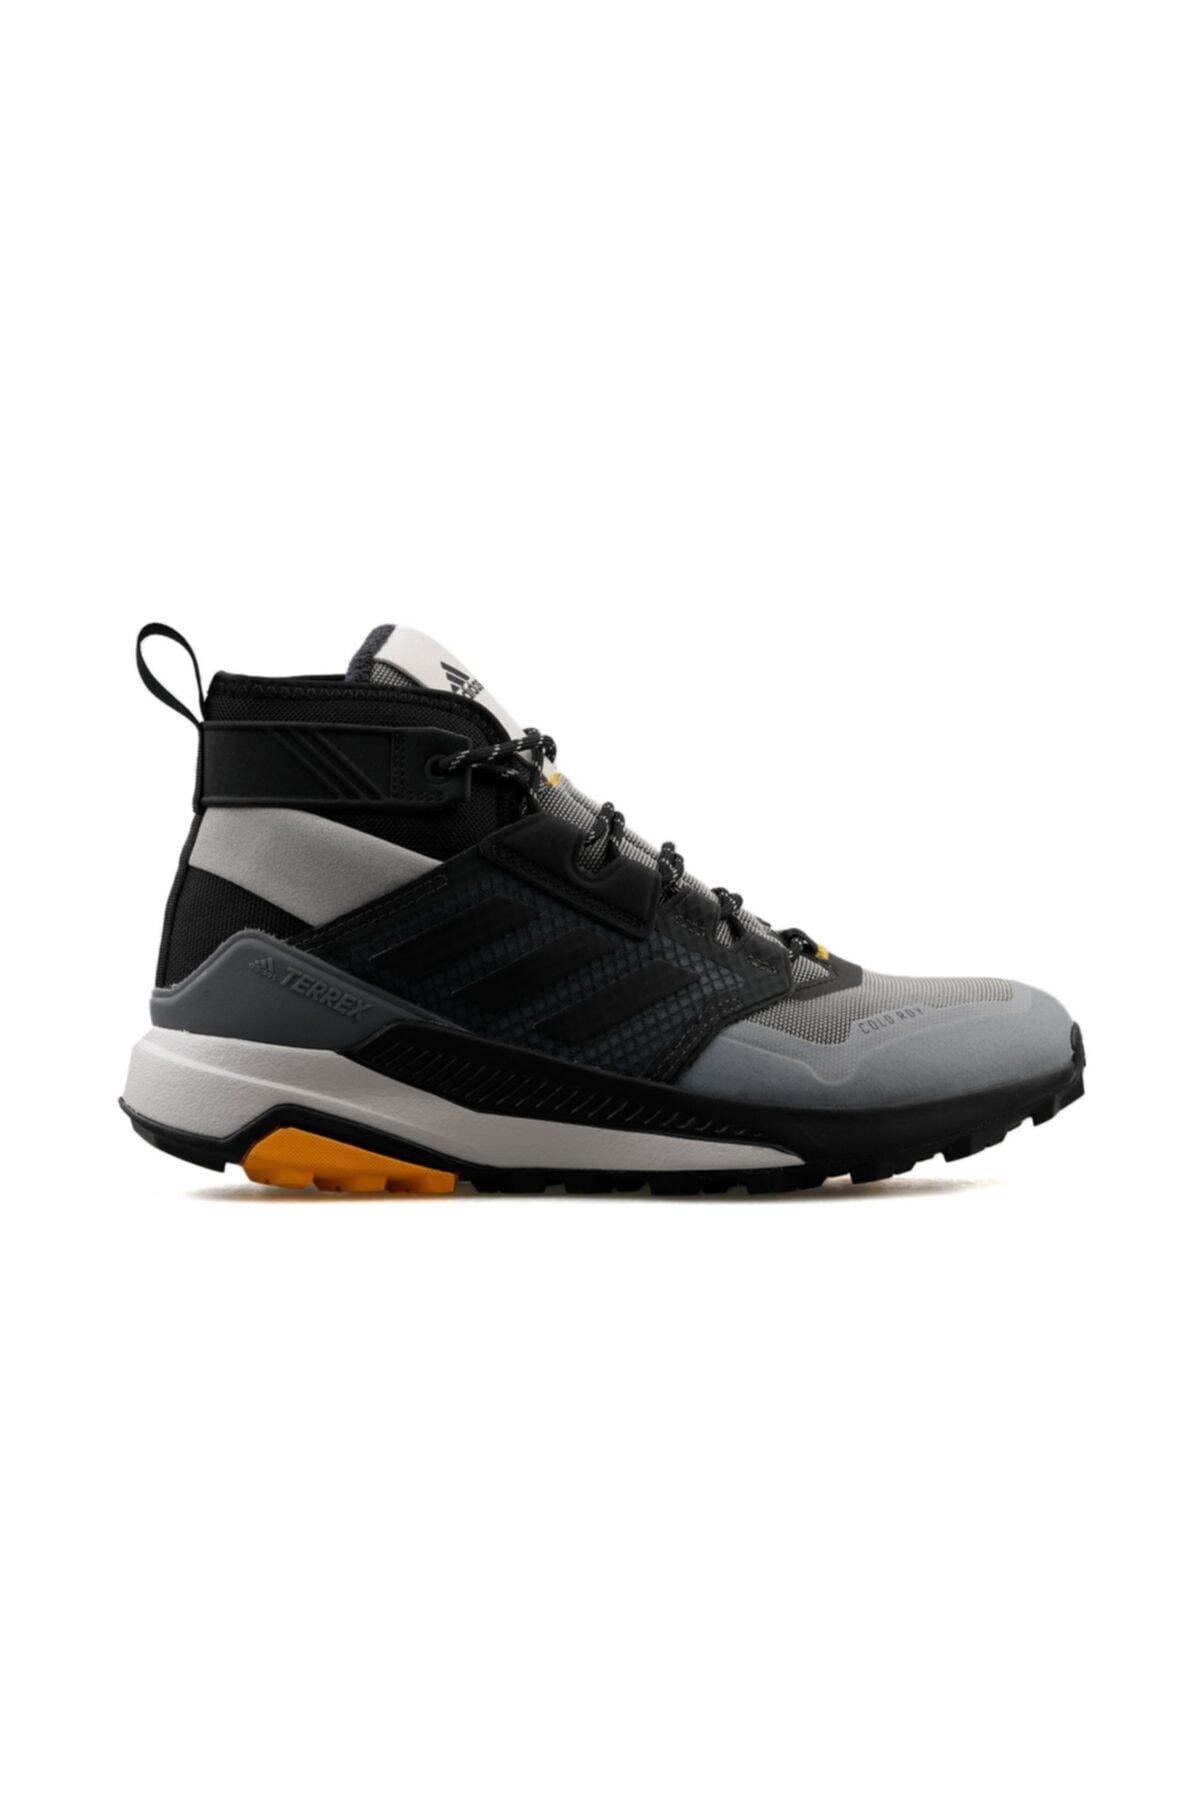 adidas Renkli Erkek Trekking Bot Ve Ayakkabısı Fv6886 Terrex Trail Beater Mid C.rdy 1